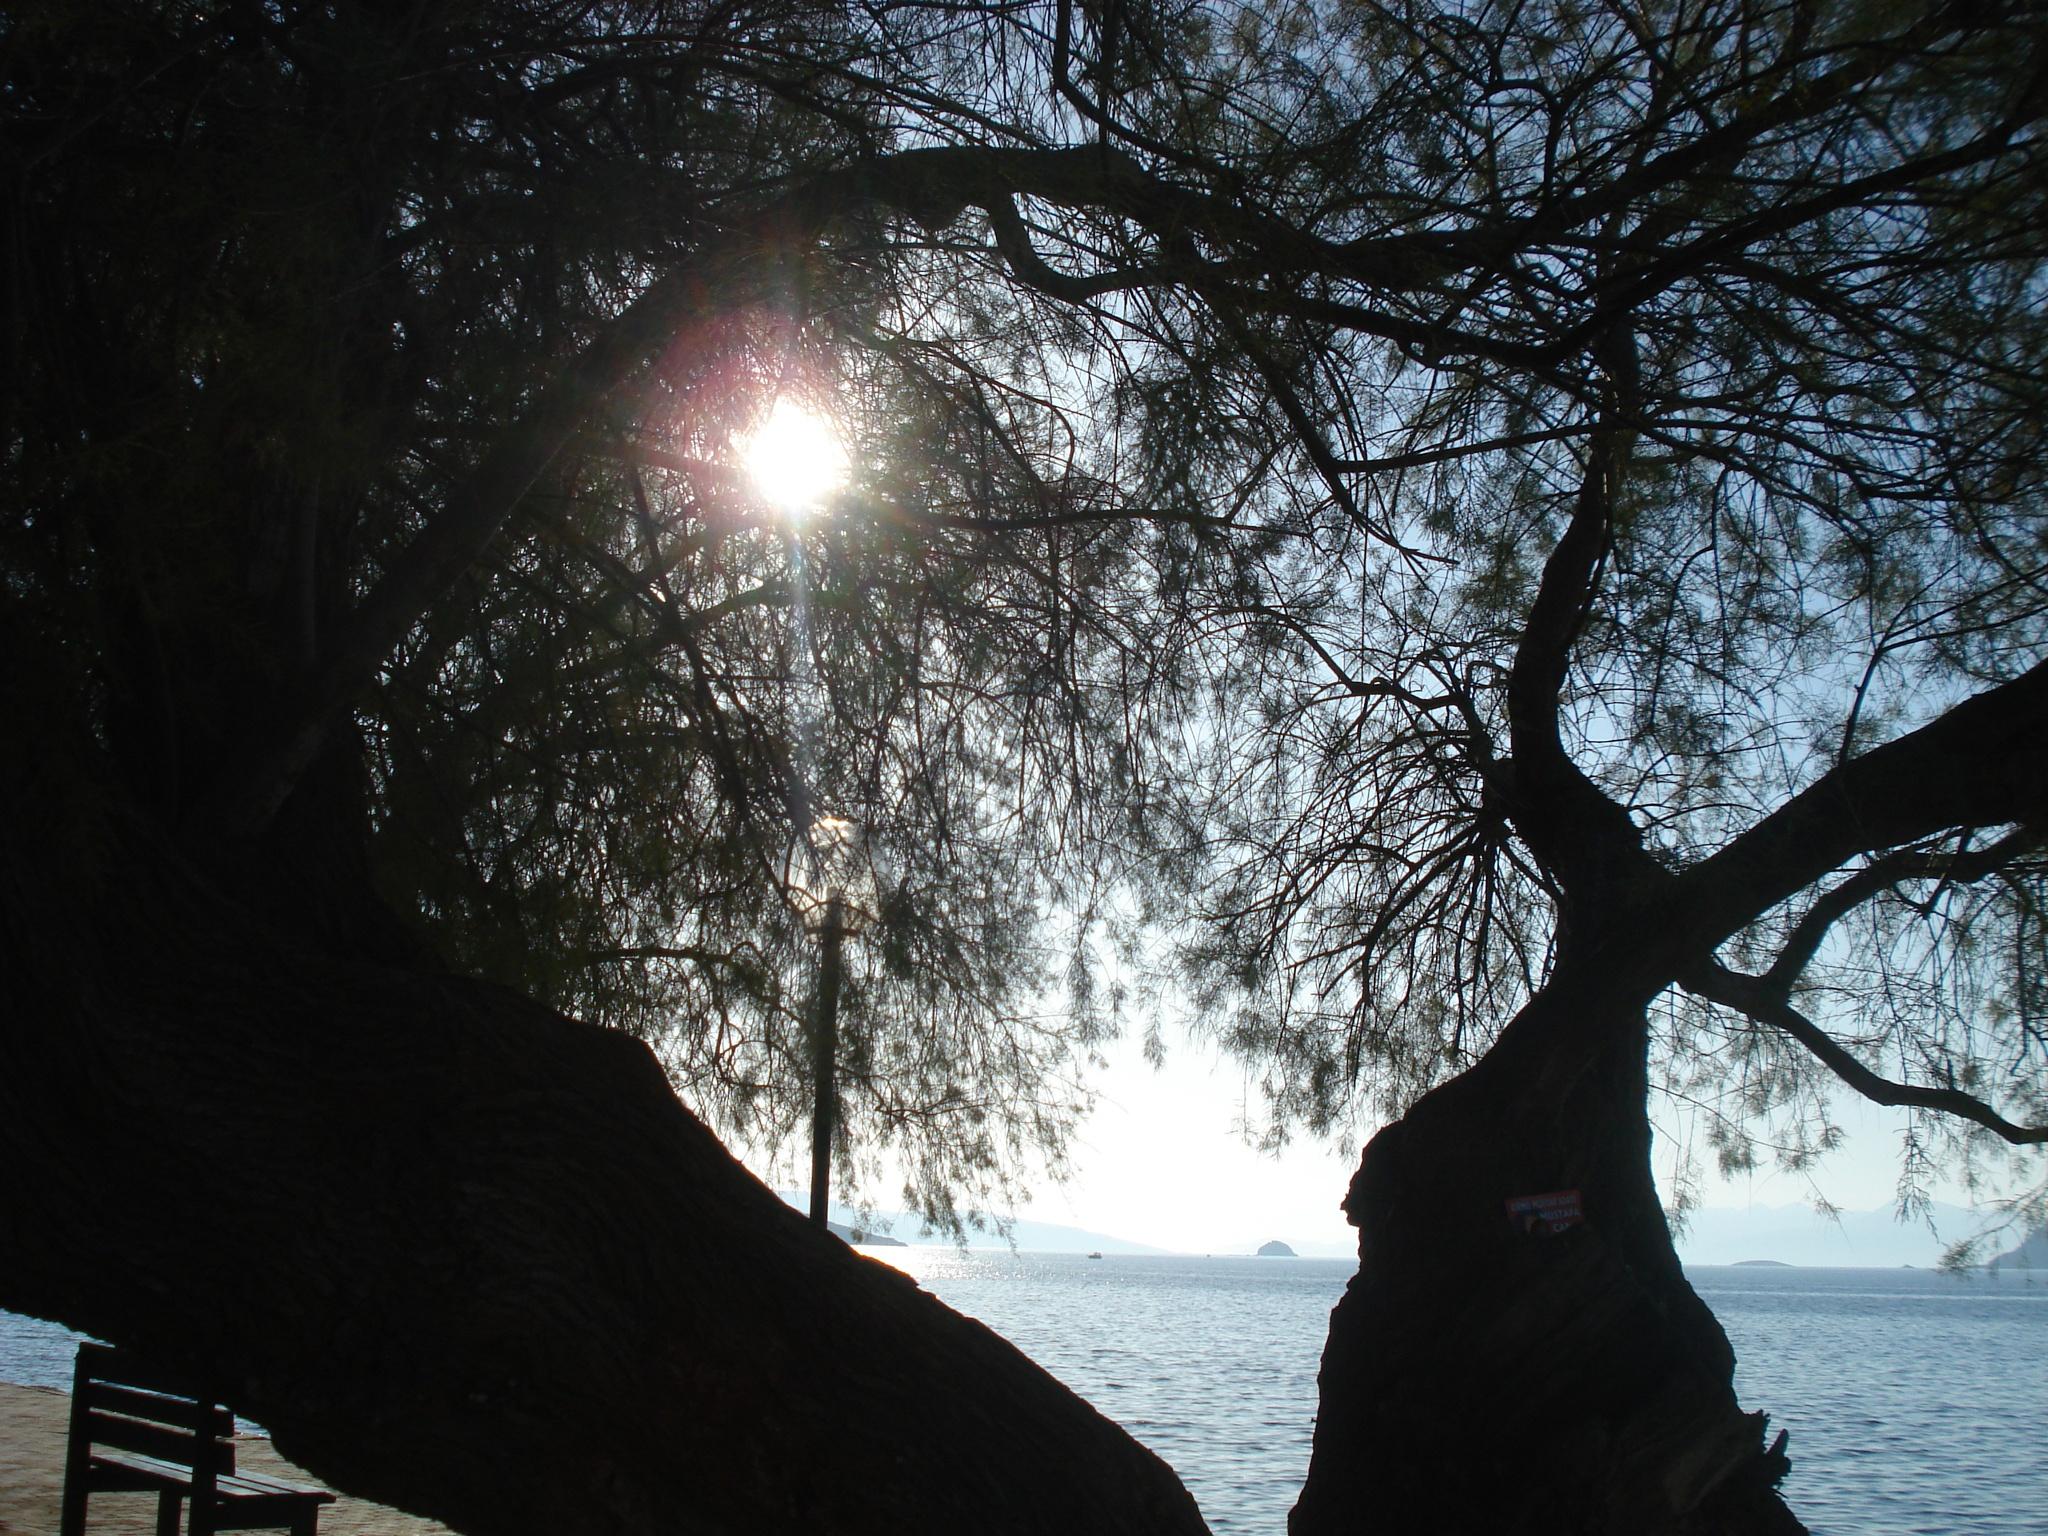 SUN SHINE  IN A SOLAR DAY.. by GÜVEN YENERSOY